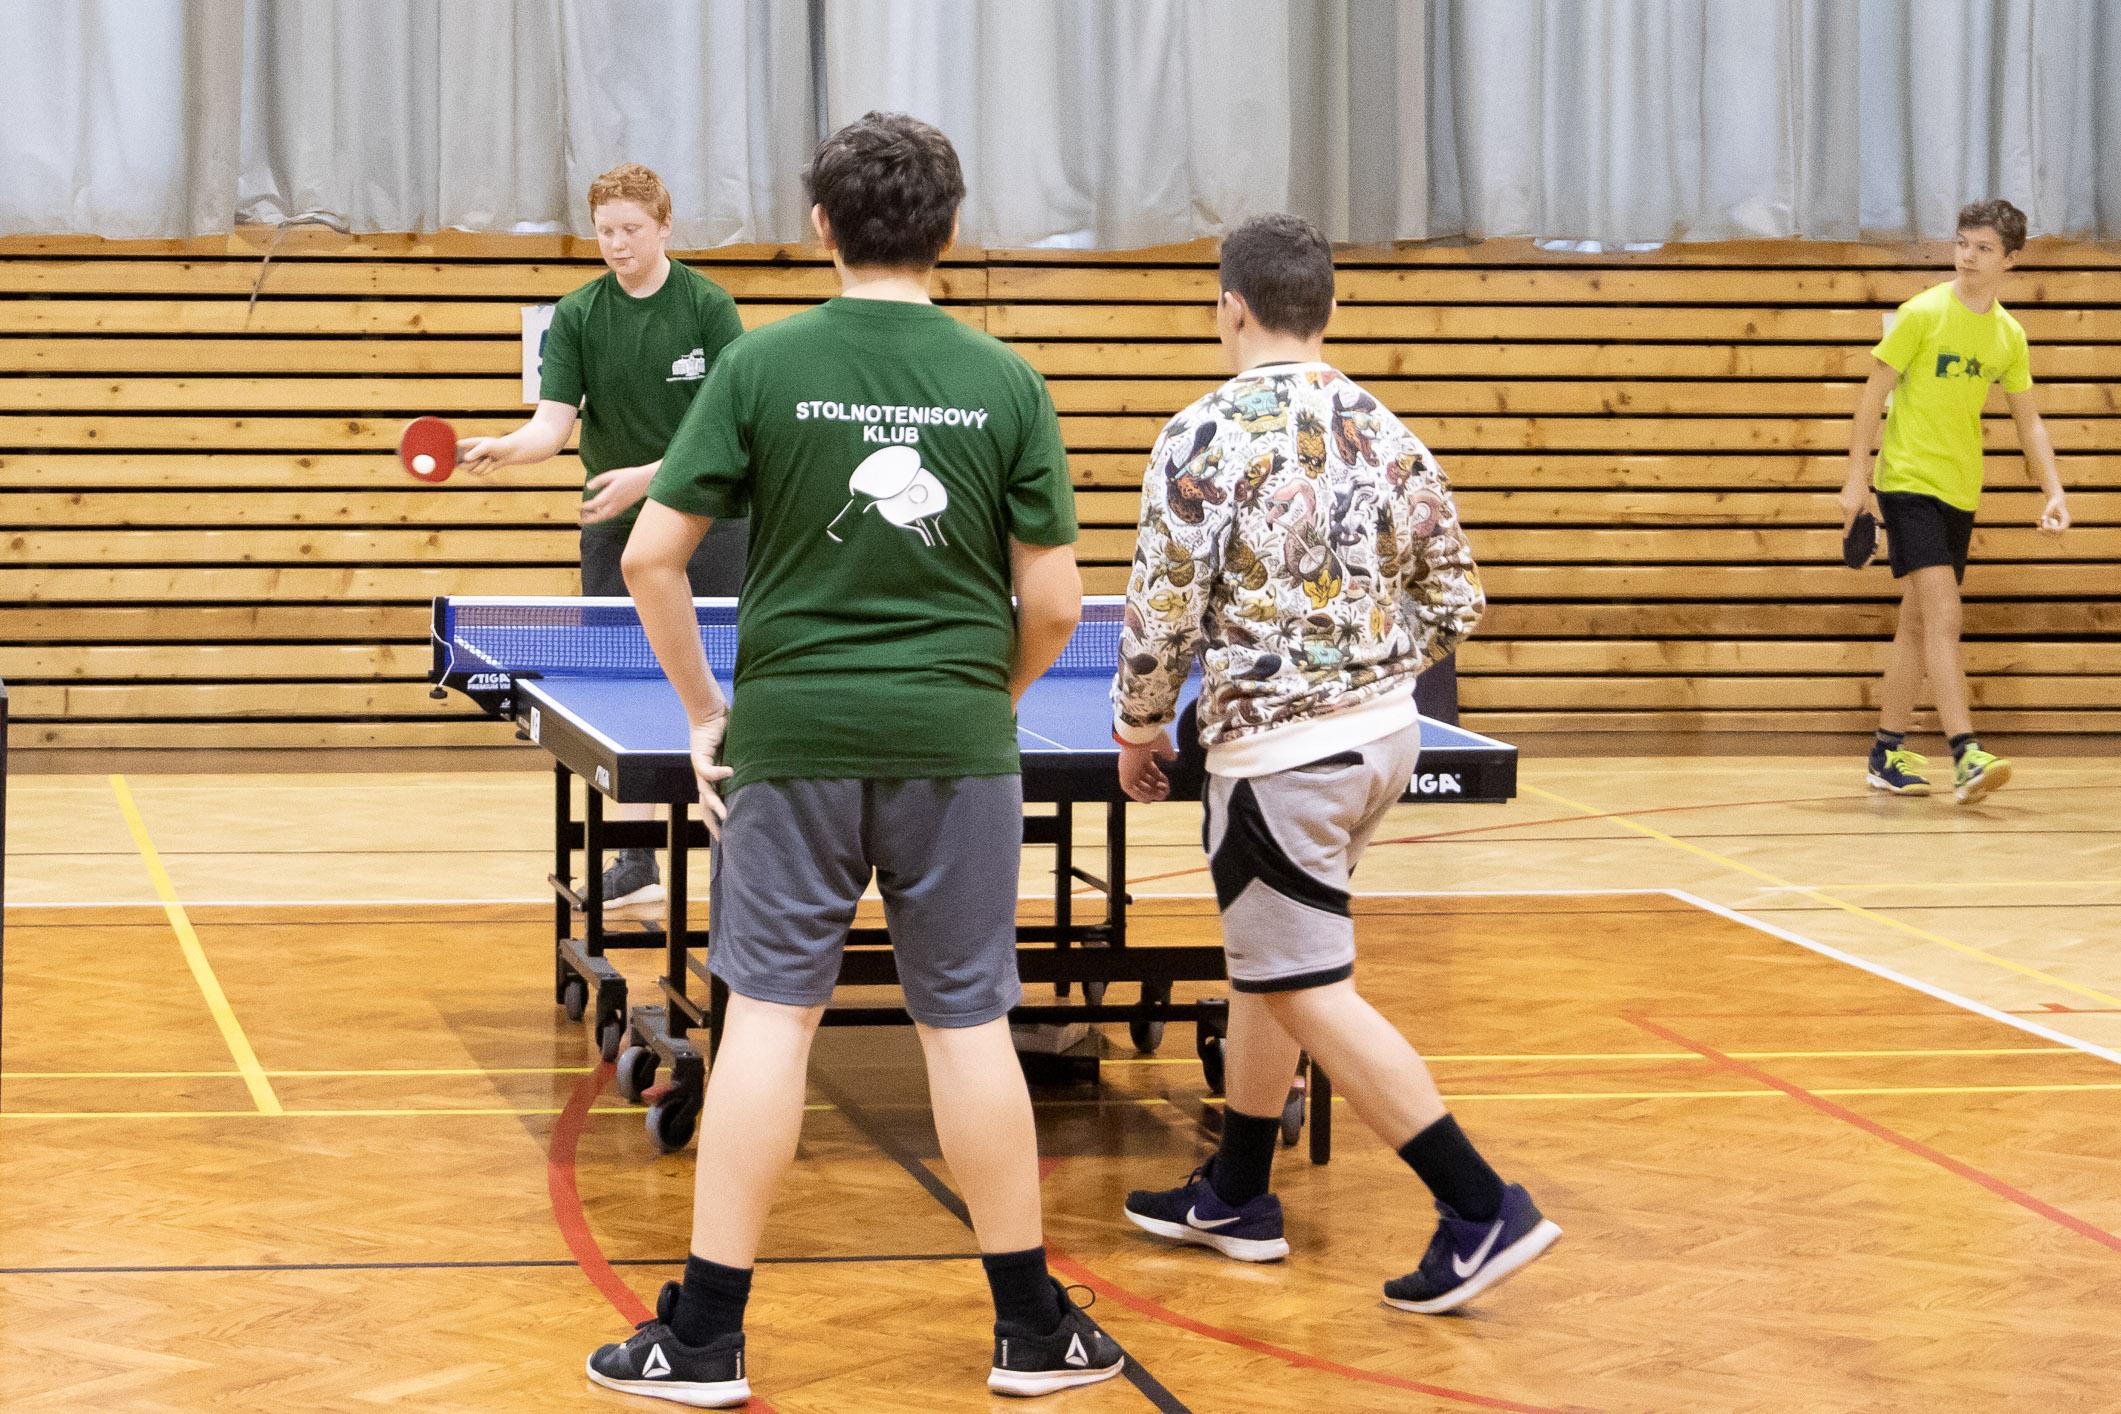 oblast-turnaj-mladeze-zv-dt-ka-1